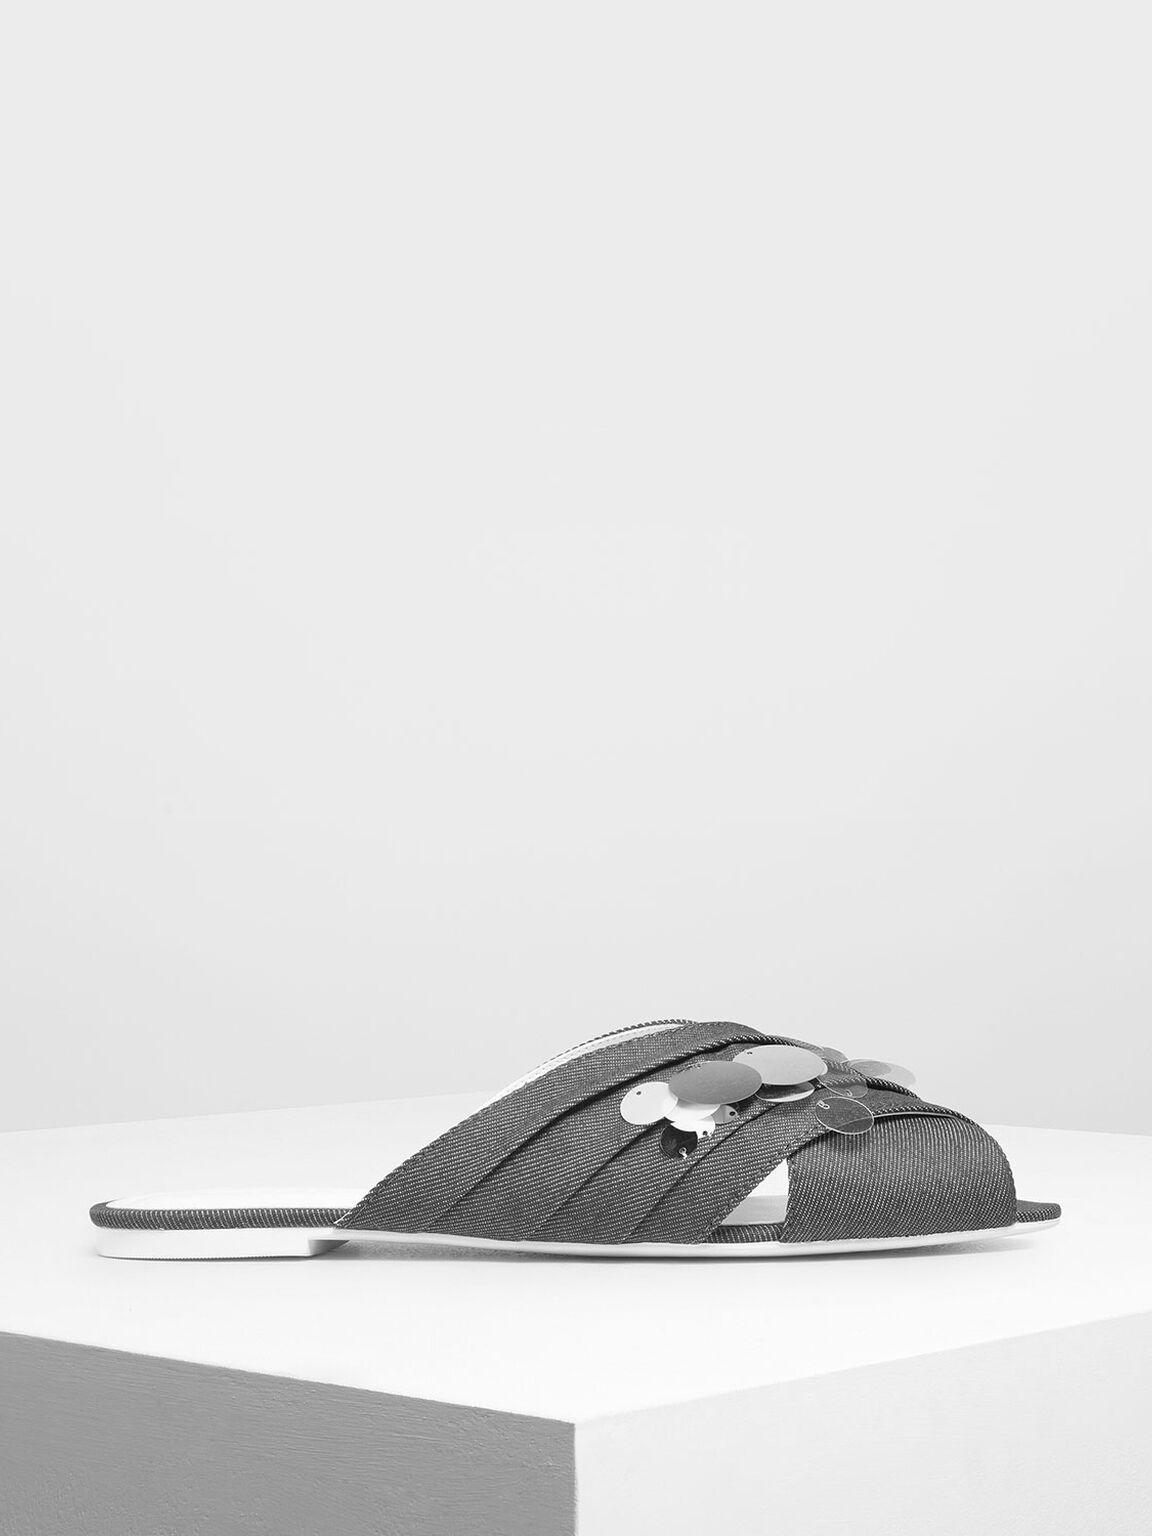 Sequin Peep Toe Denim Sliders, Light Grey, hi-res